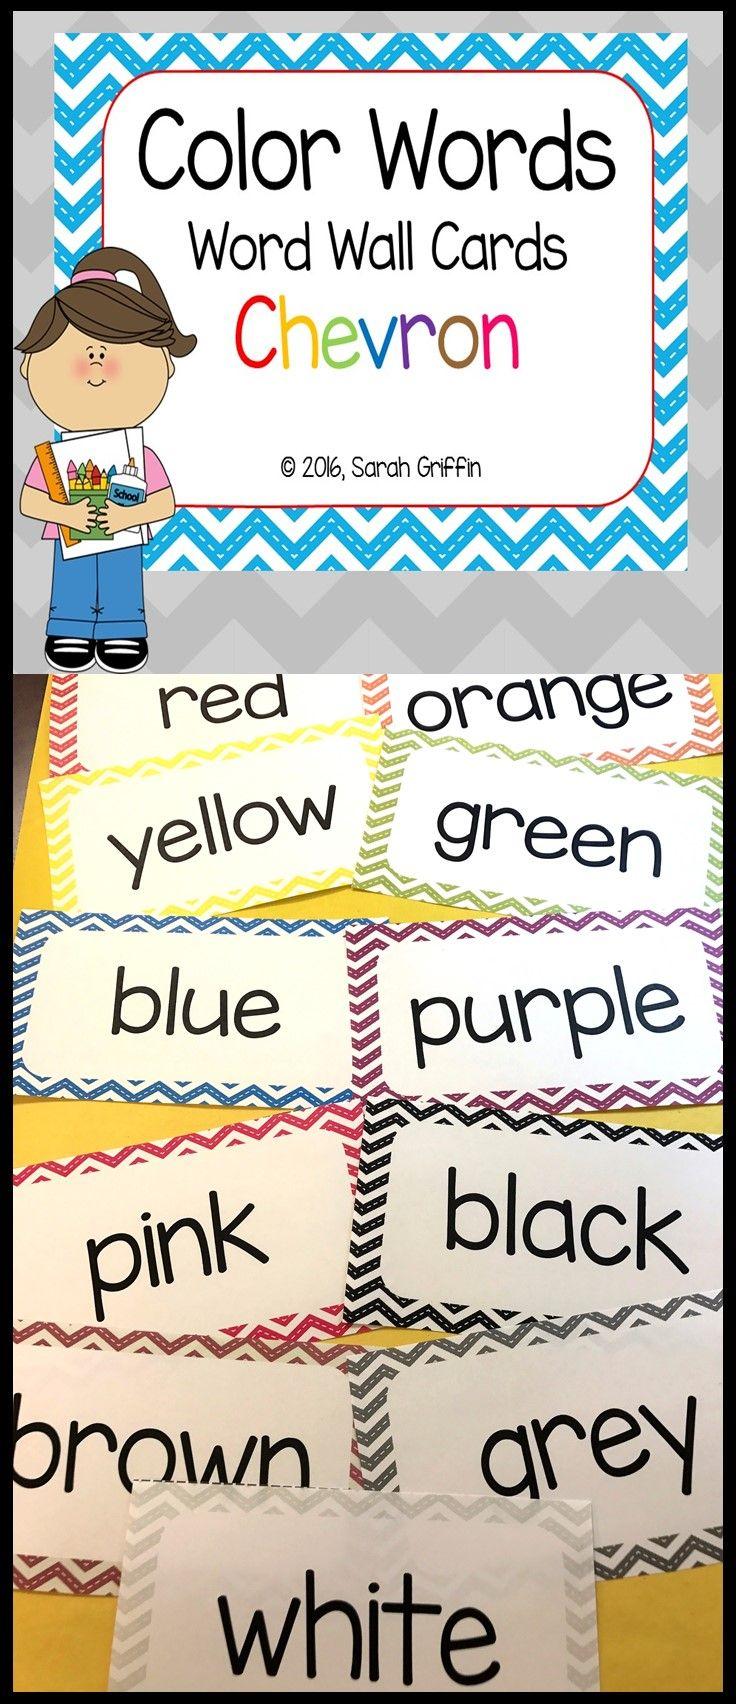 Color Words | Word Cards | Chevron | Word Wall | Bulletin Boards | Color matching games | Pocket Chart | Preschool | PreK | Kindergarten | First Grade | Second Grade